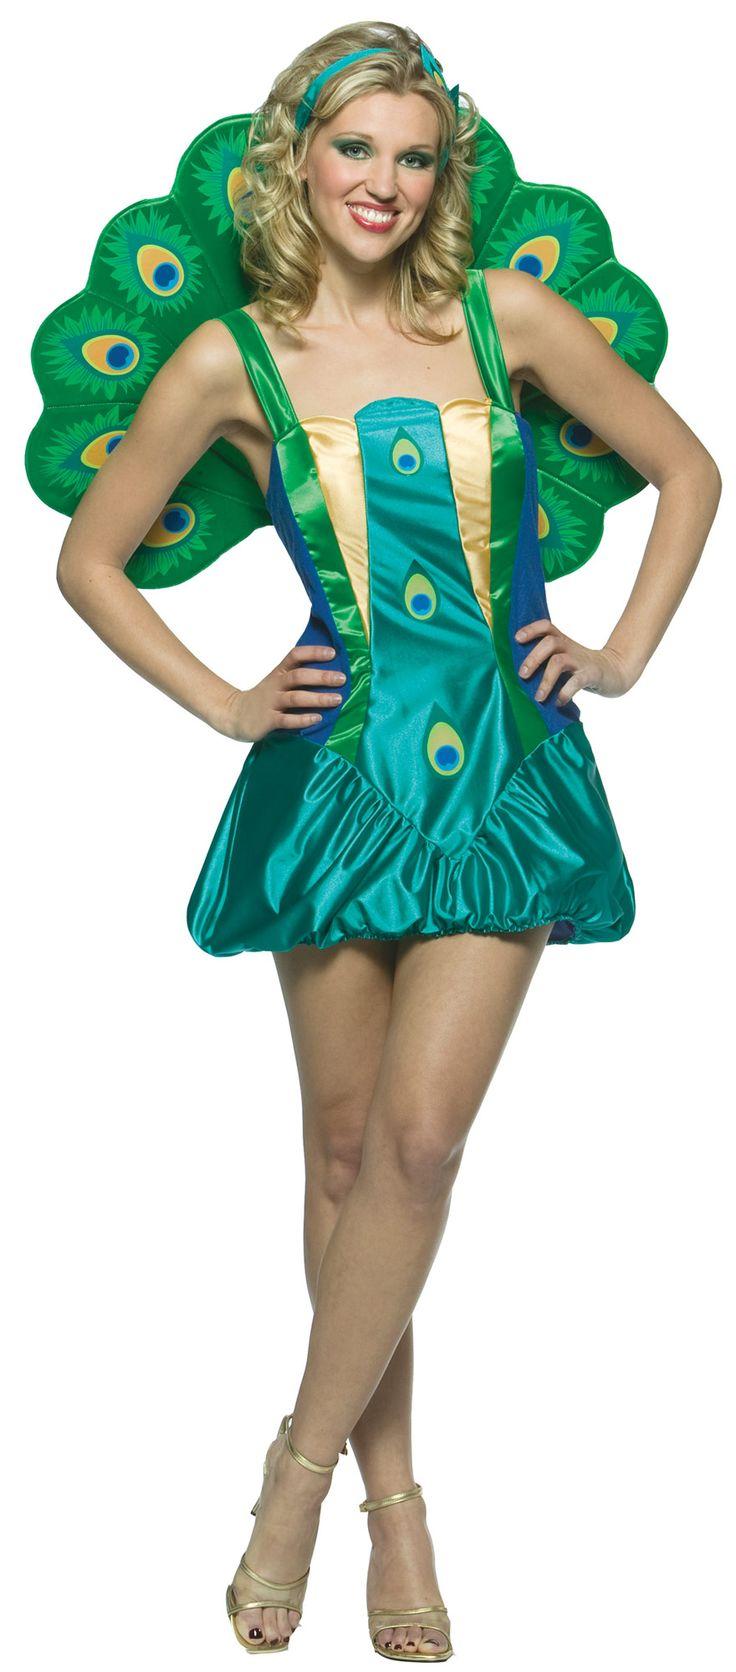 Costume pavone donna : Vegaoo.it, vendita di Costumi adulti